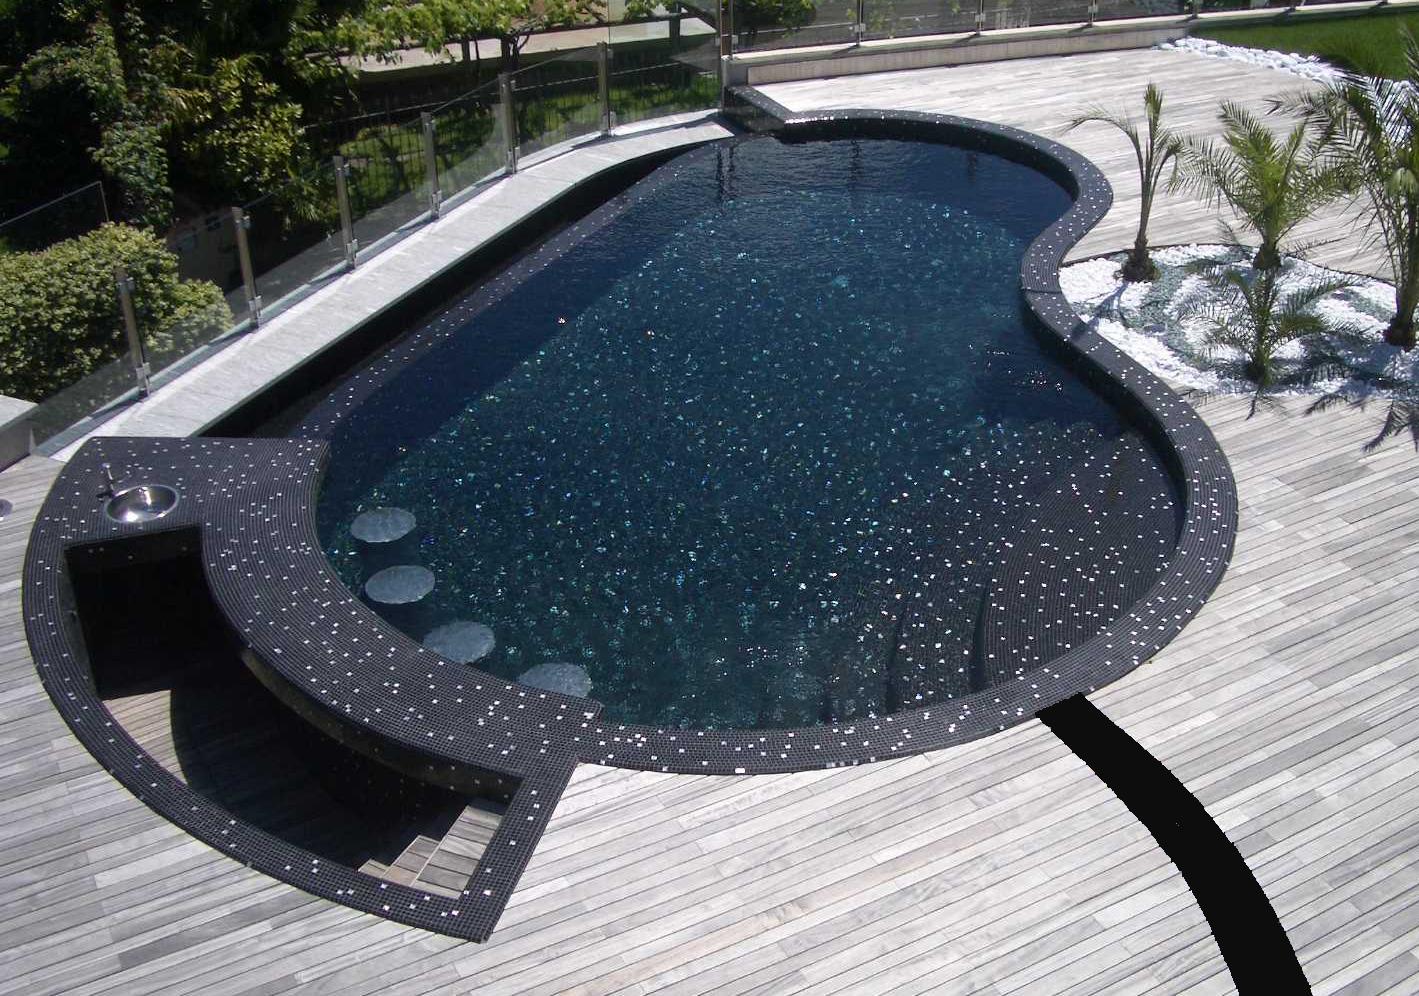 Gresite reindesa mantenimiento de piscinas - Gresite piscinas colores ...